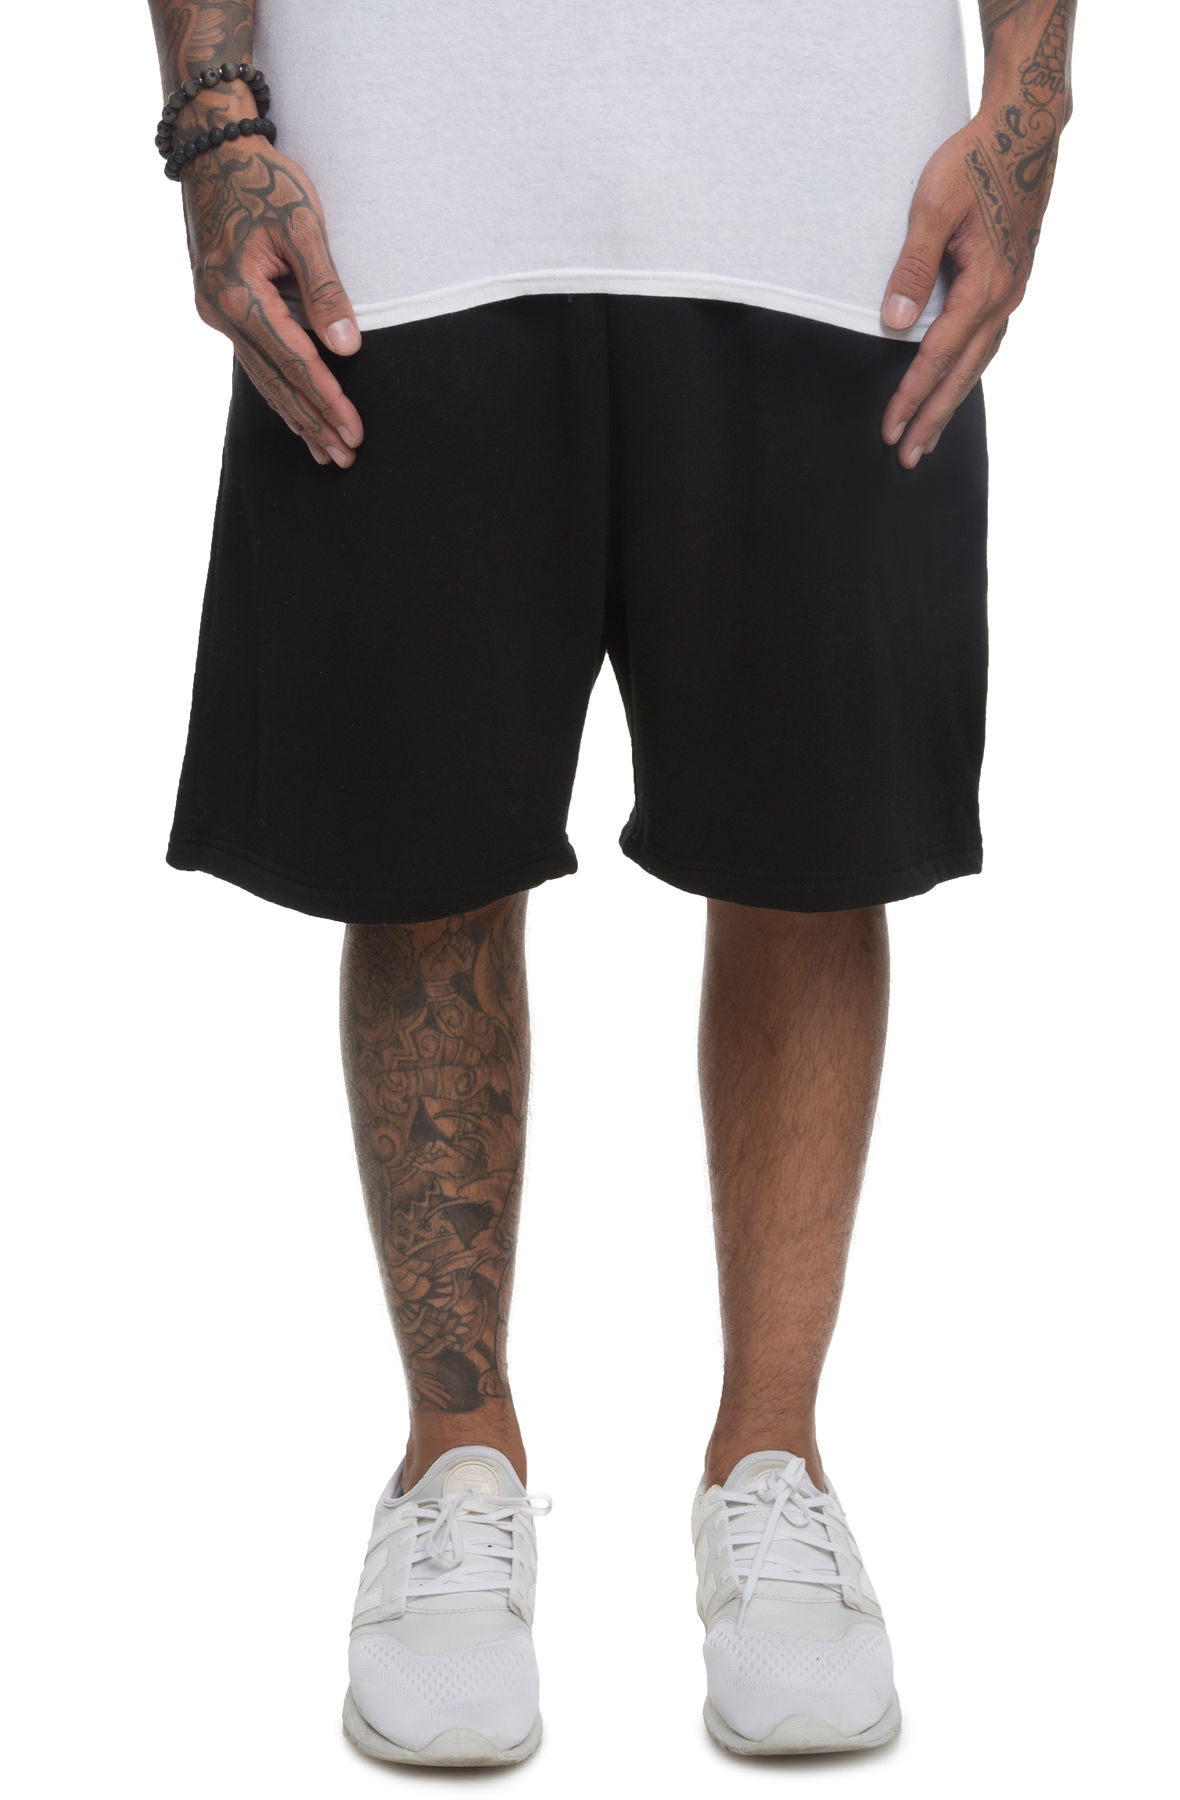 Sweatsuit Shorts